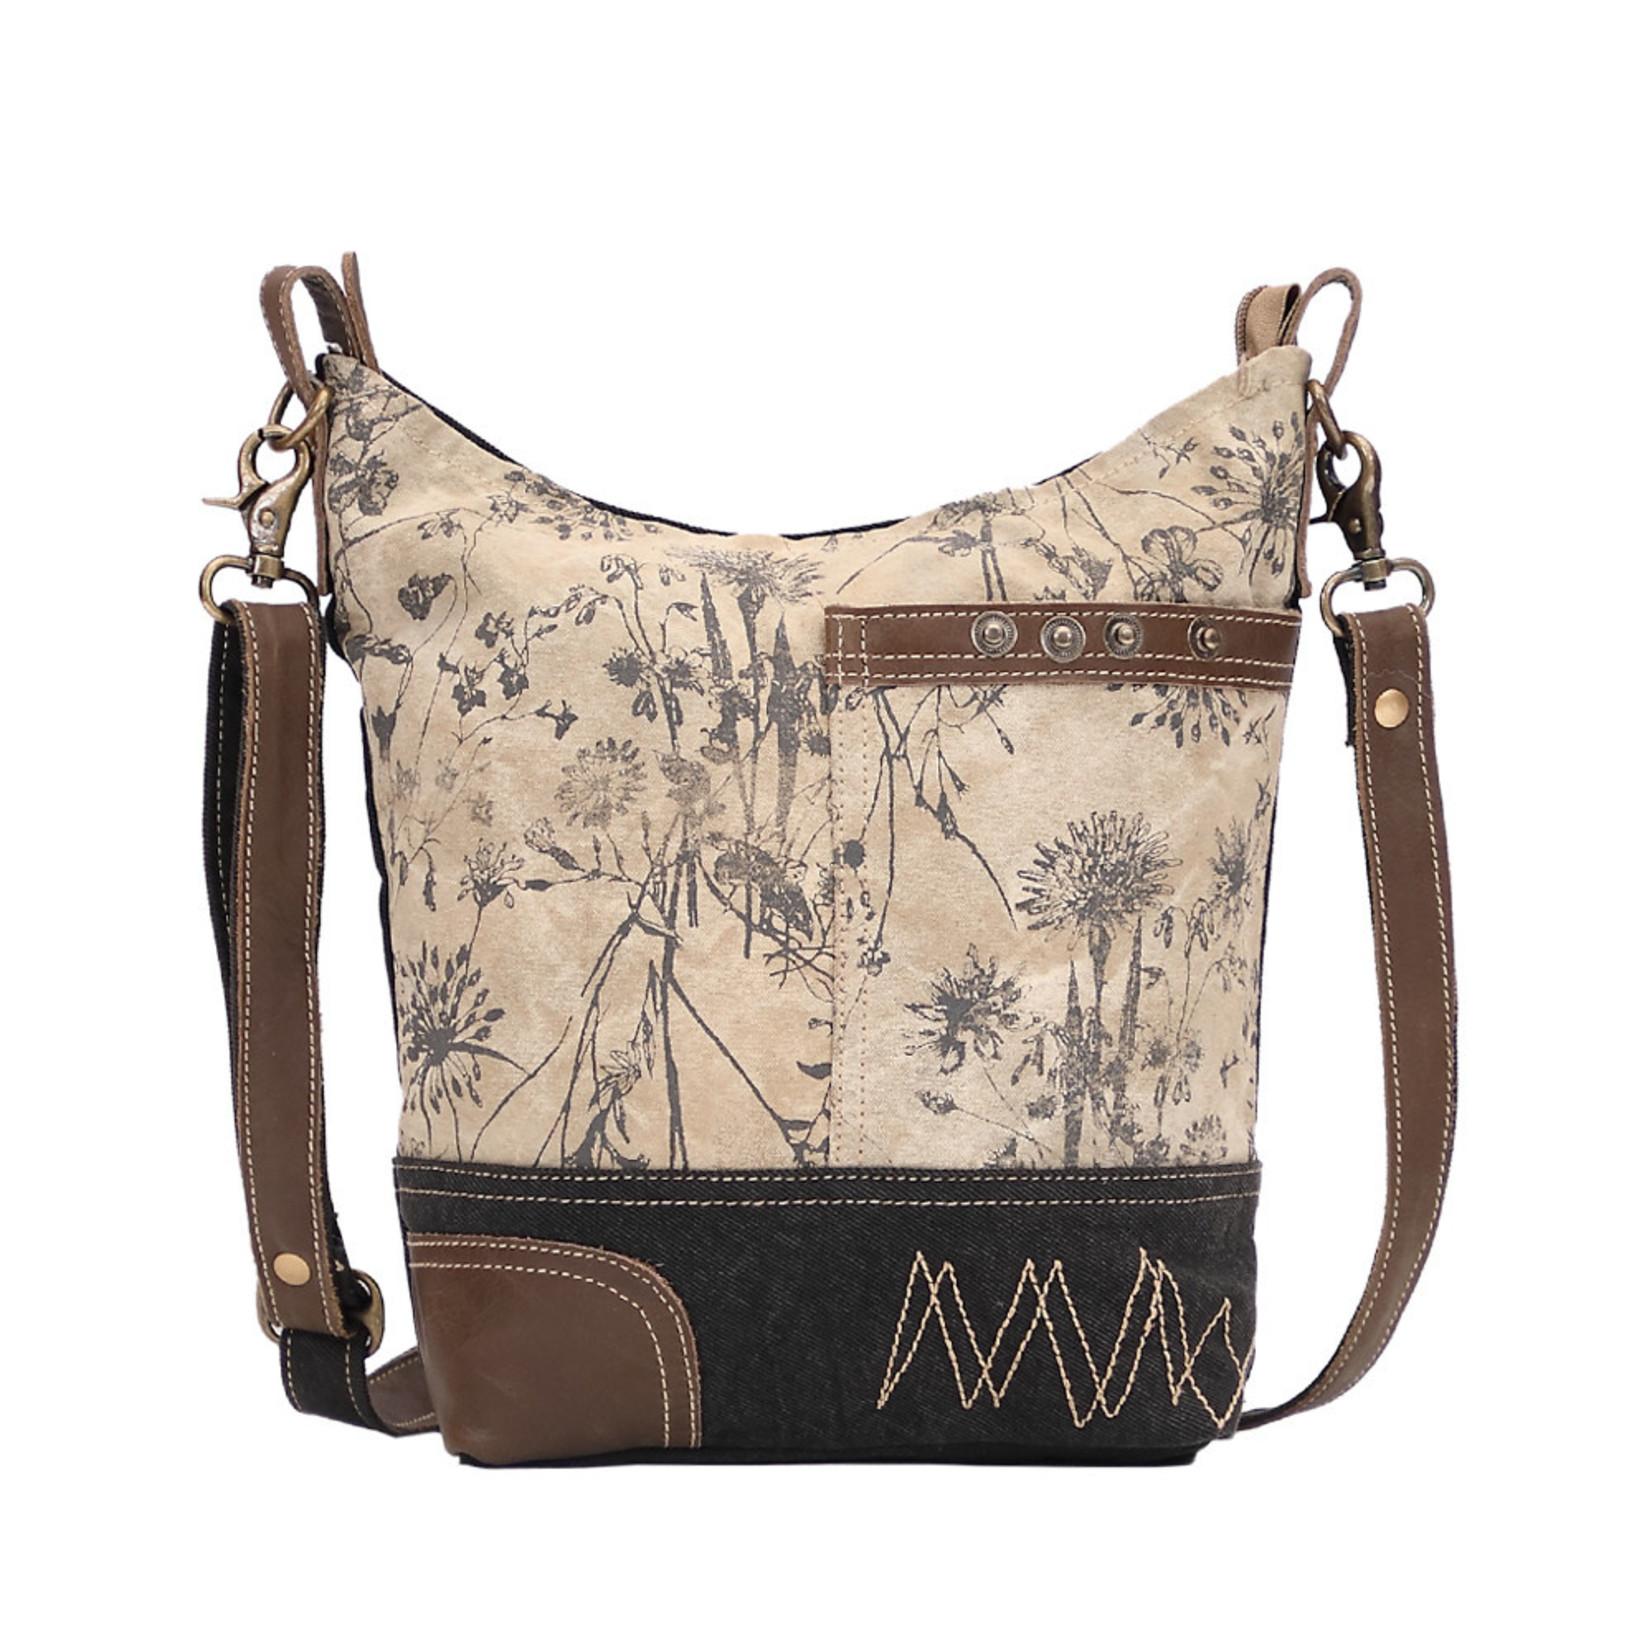 Myra Bags S-1525 Solidaster Shoulder Bag